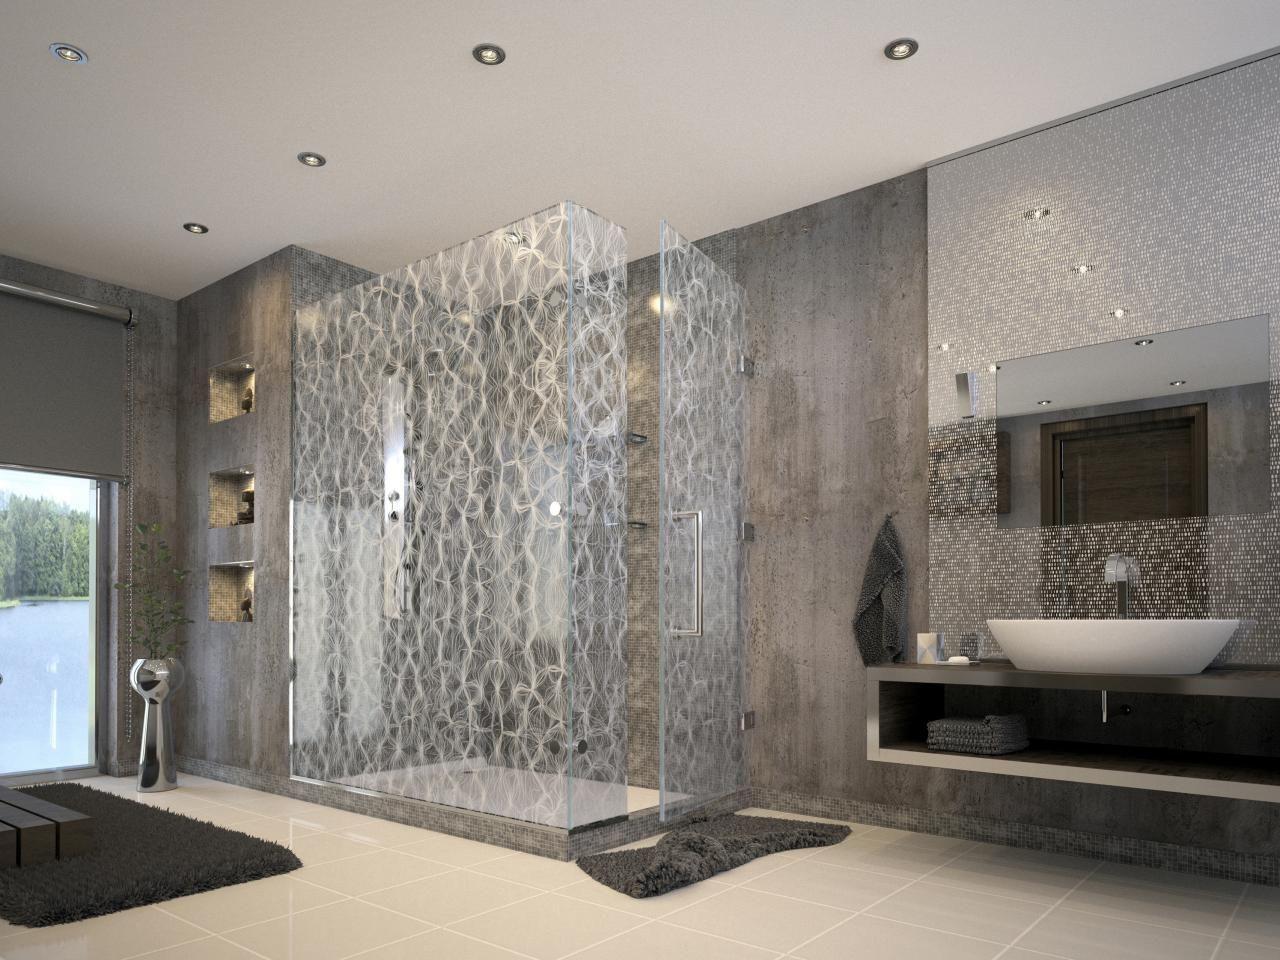 Luxurious Showers | Interior Design | Pinterest | Shower panels ...